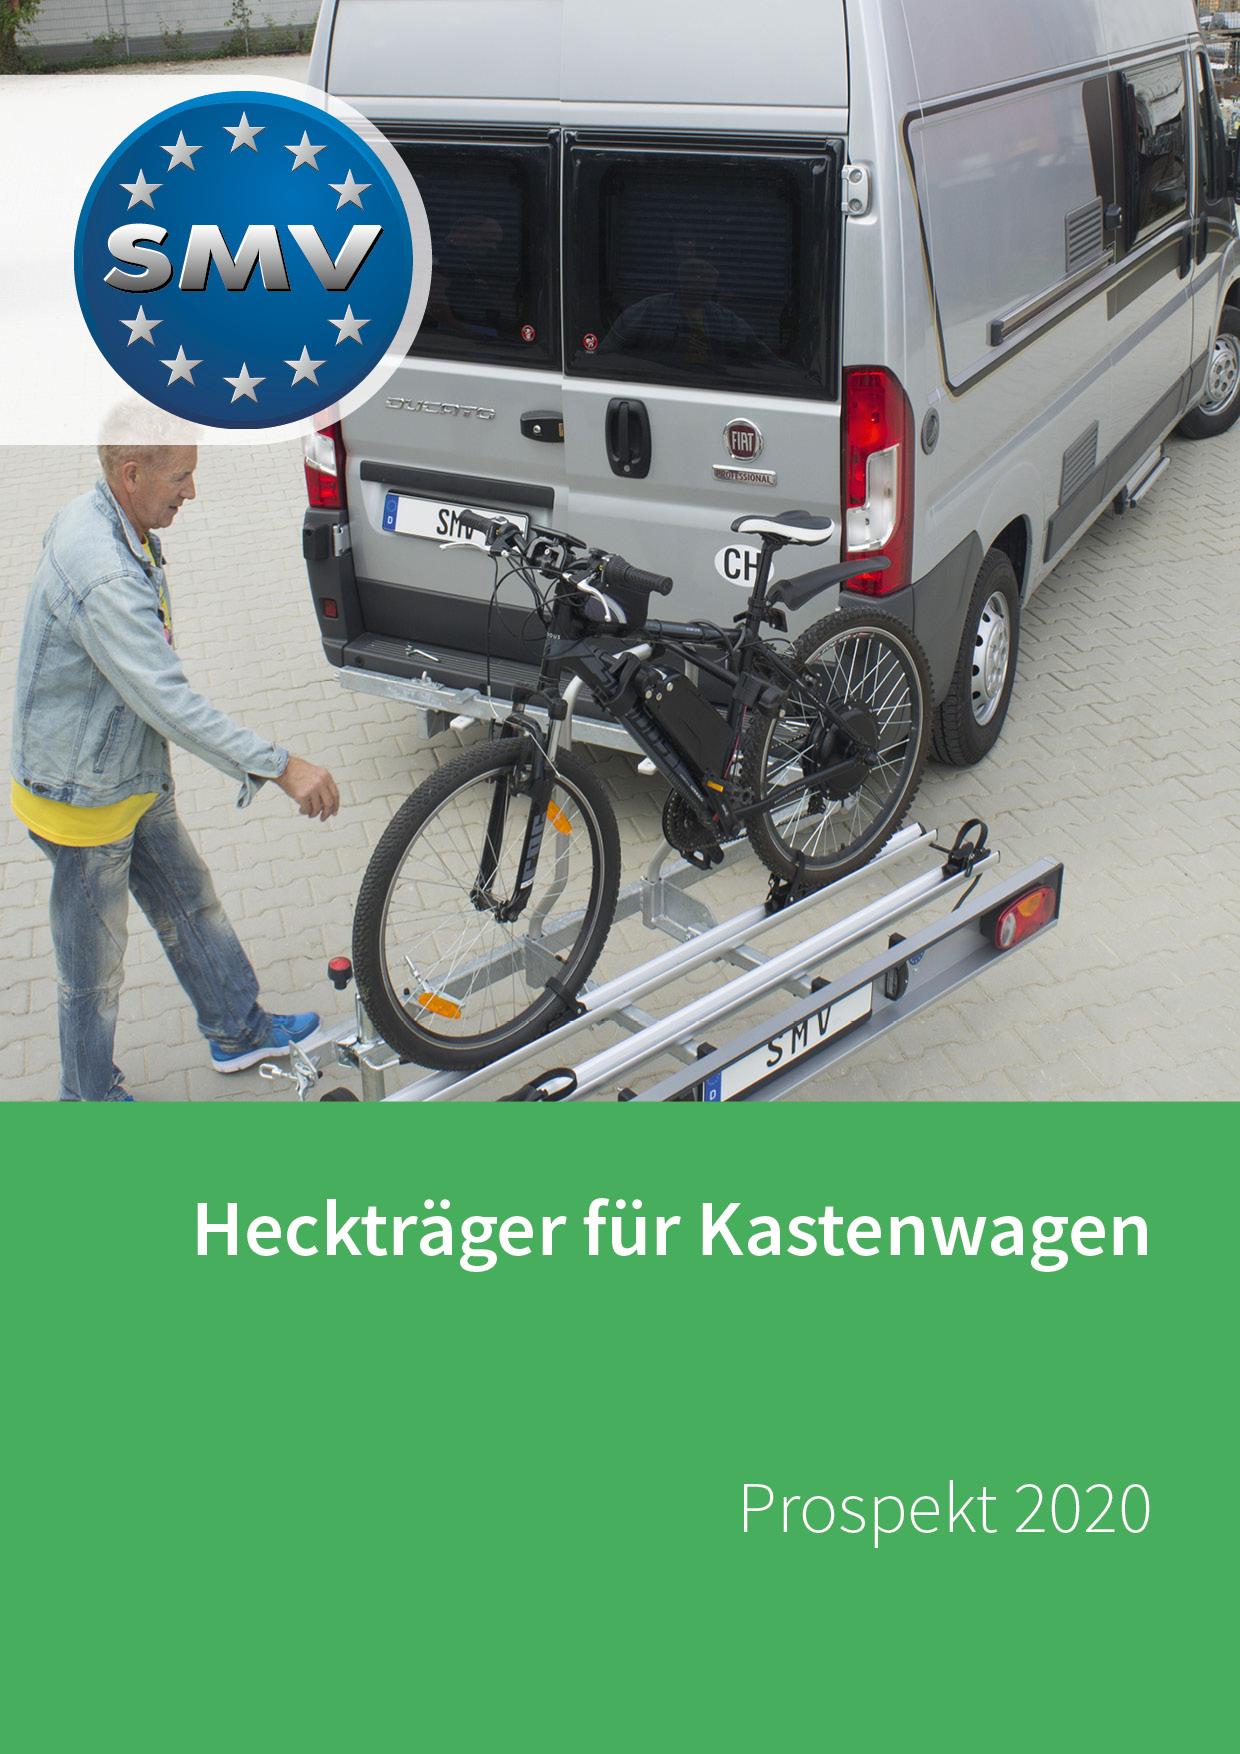 SMV Hecktraeger Kastenwagen 2020